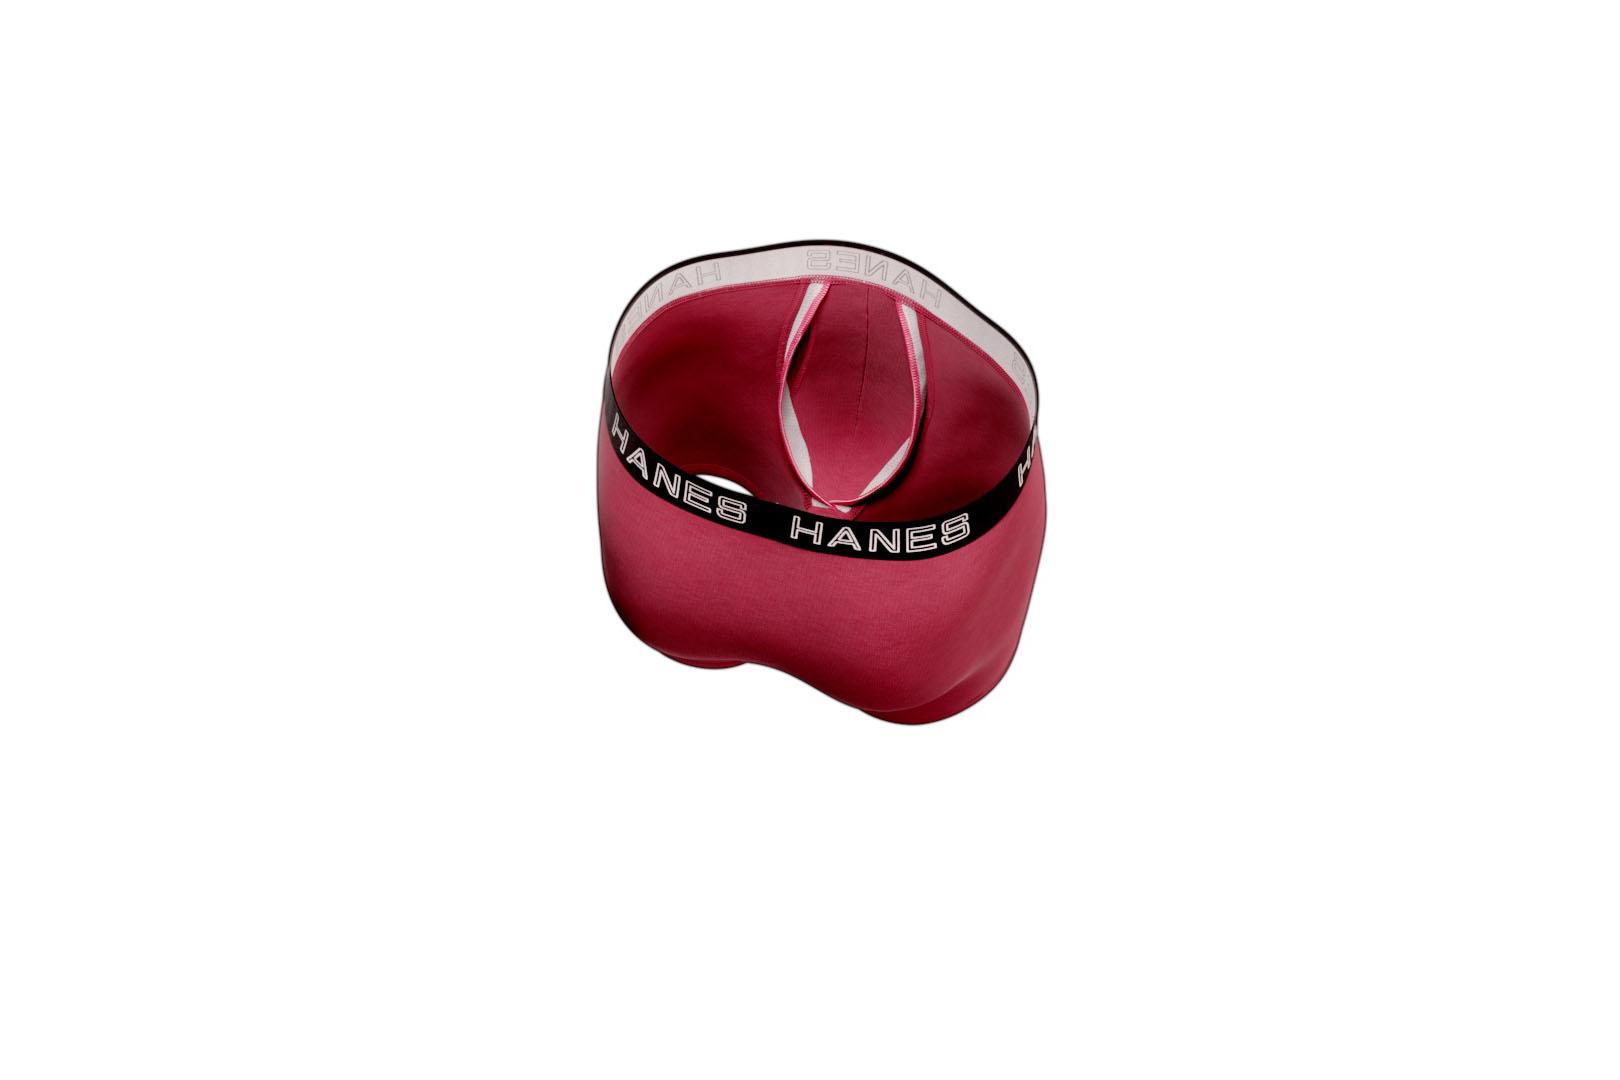 The new boxer briefs feature a patent-pending pouch construction.